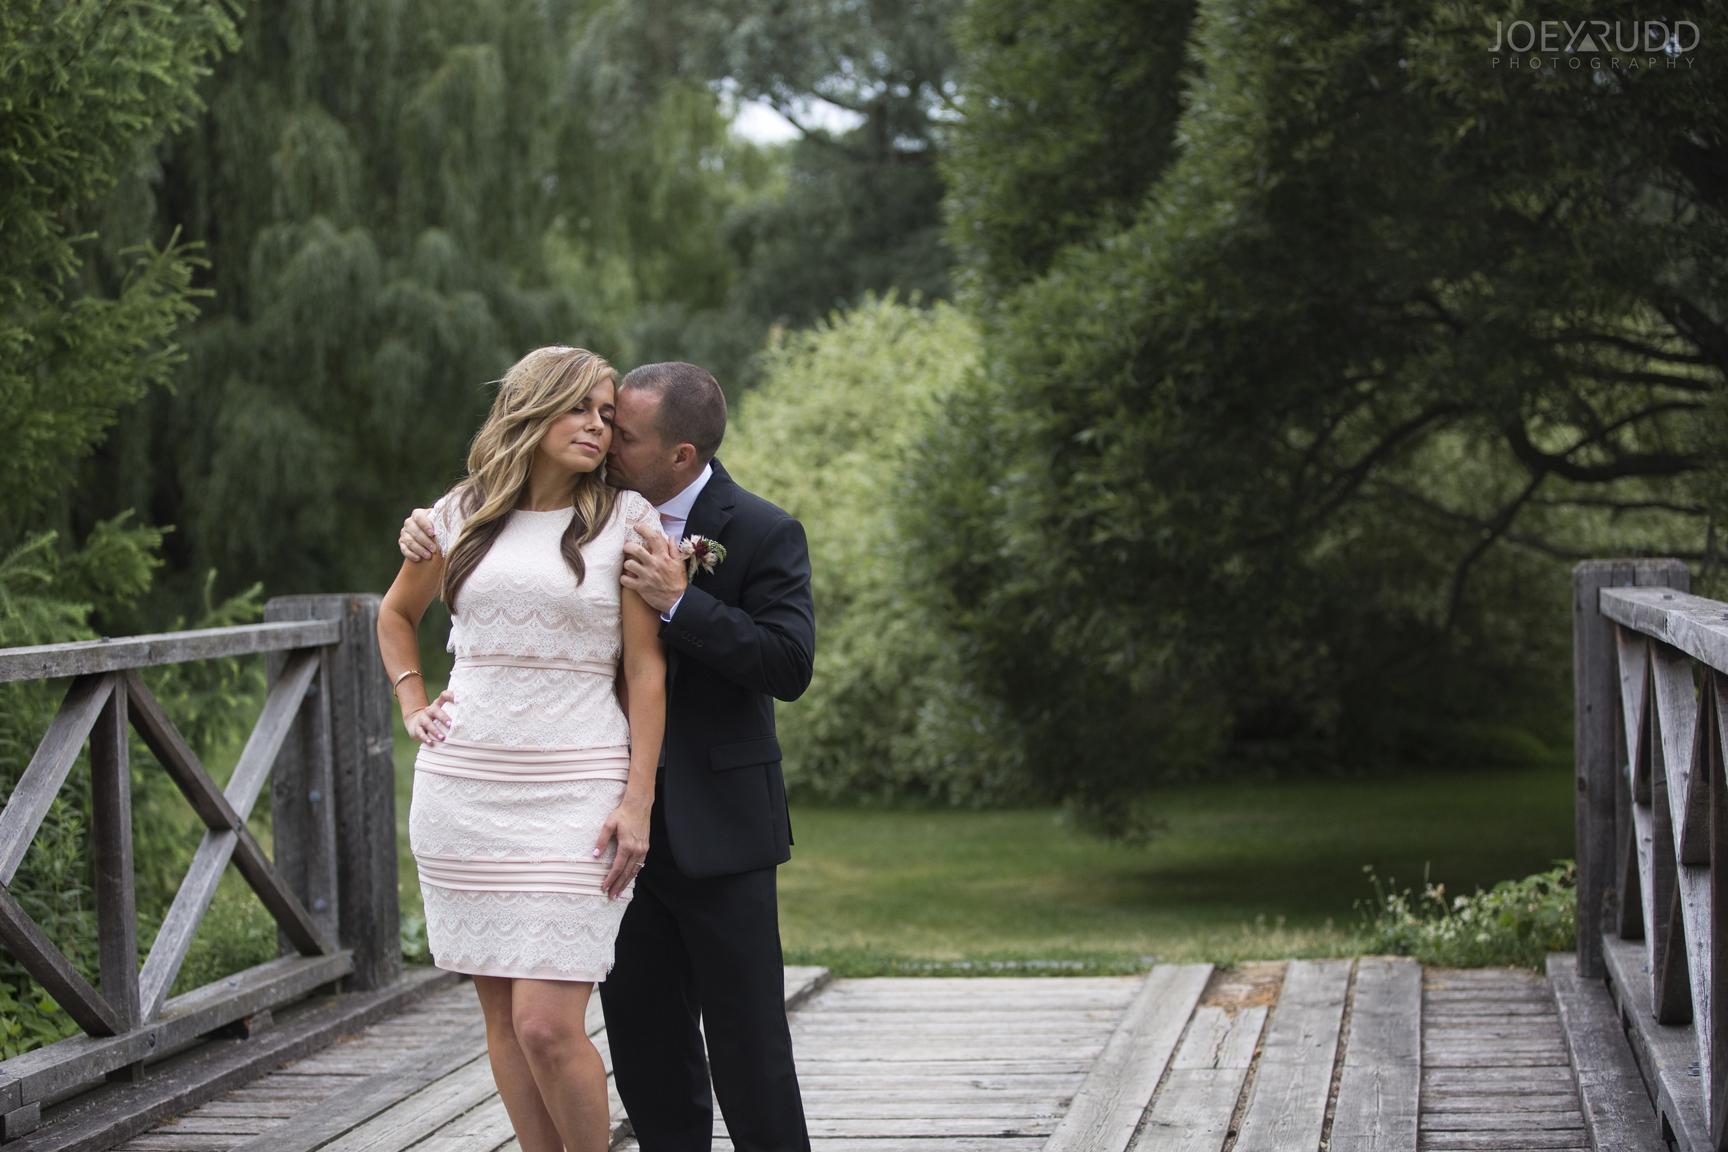 Elopement Wedding by Ottawa Wedding Photographer Joey Rudd Photography Arboretum Couple